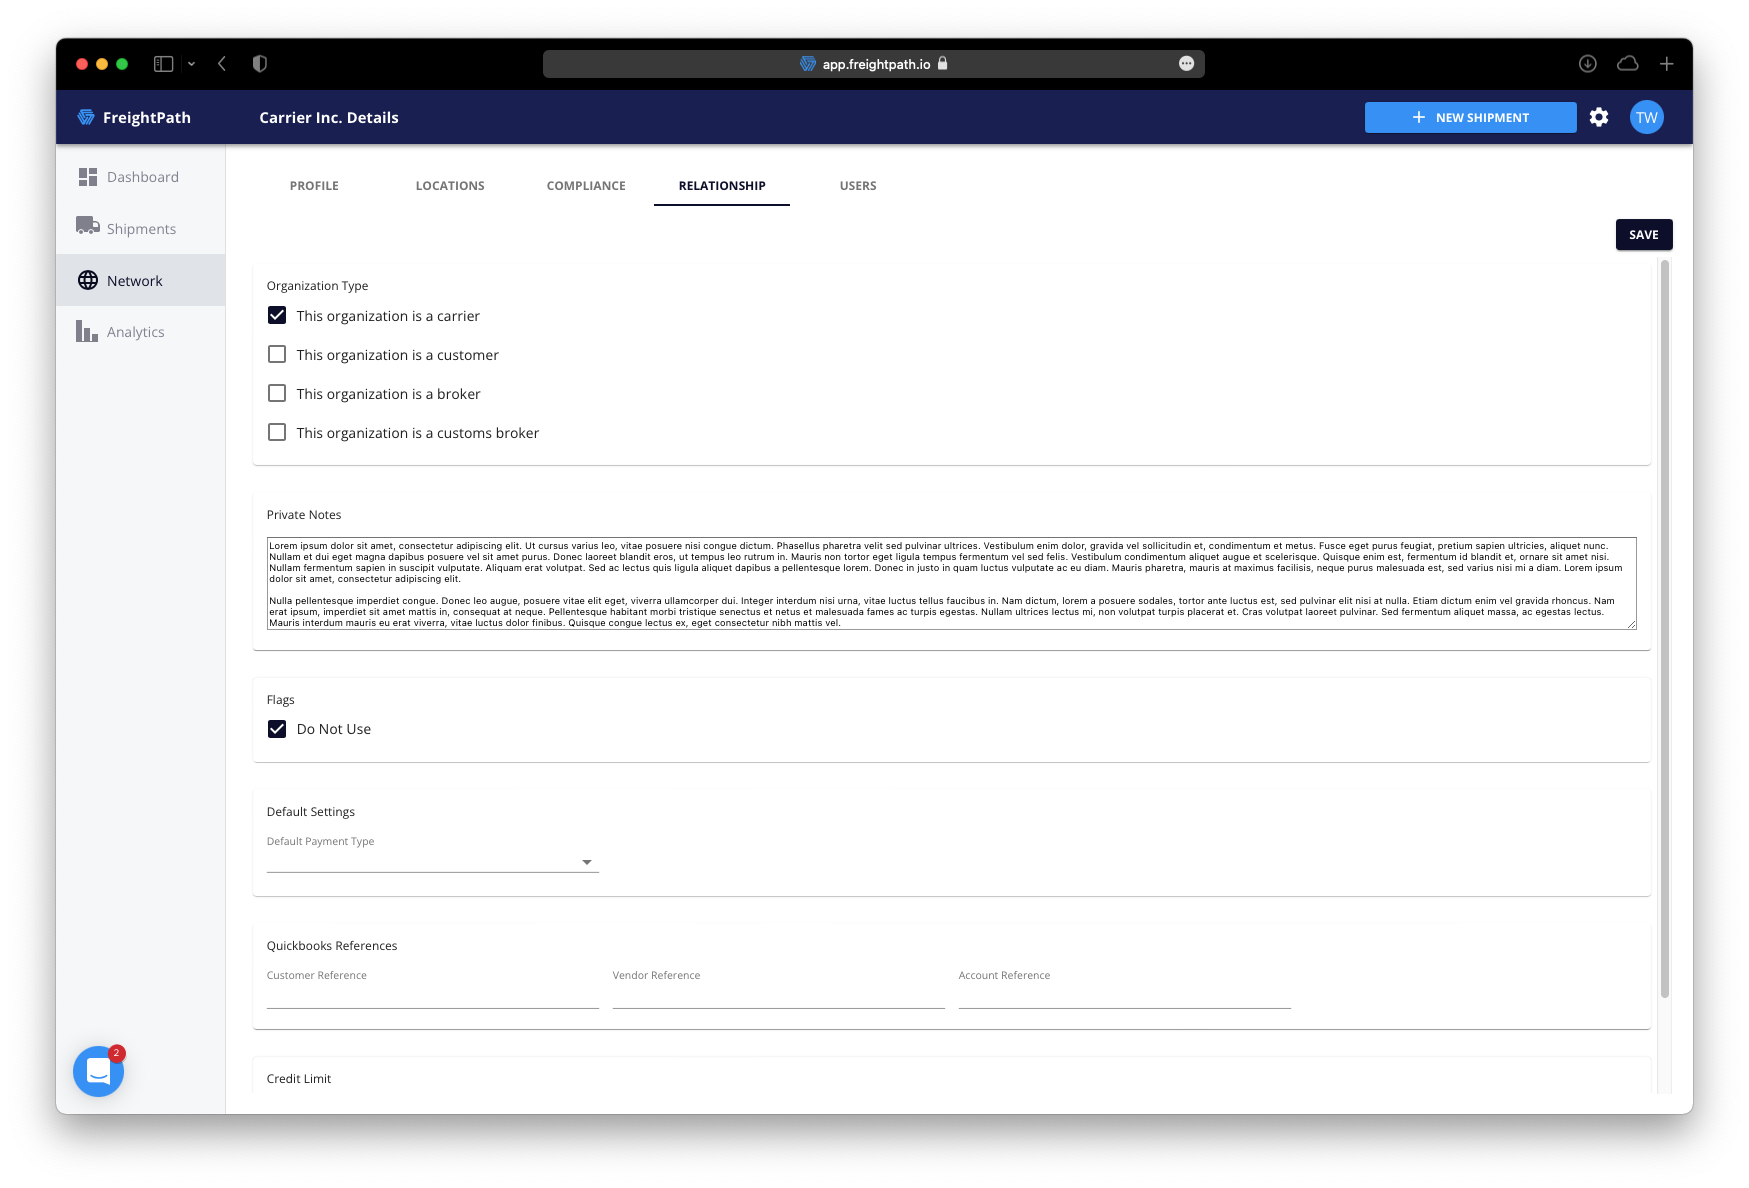 freightpath tms carrier compliance screenshot